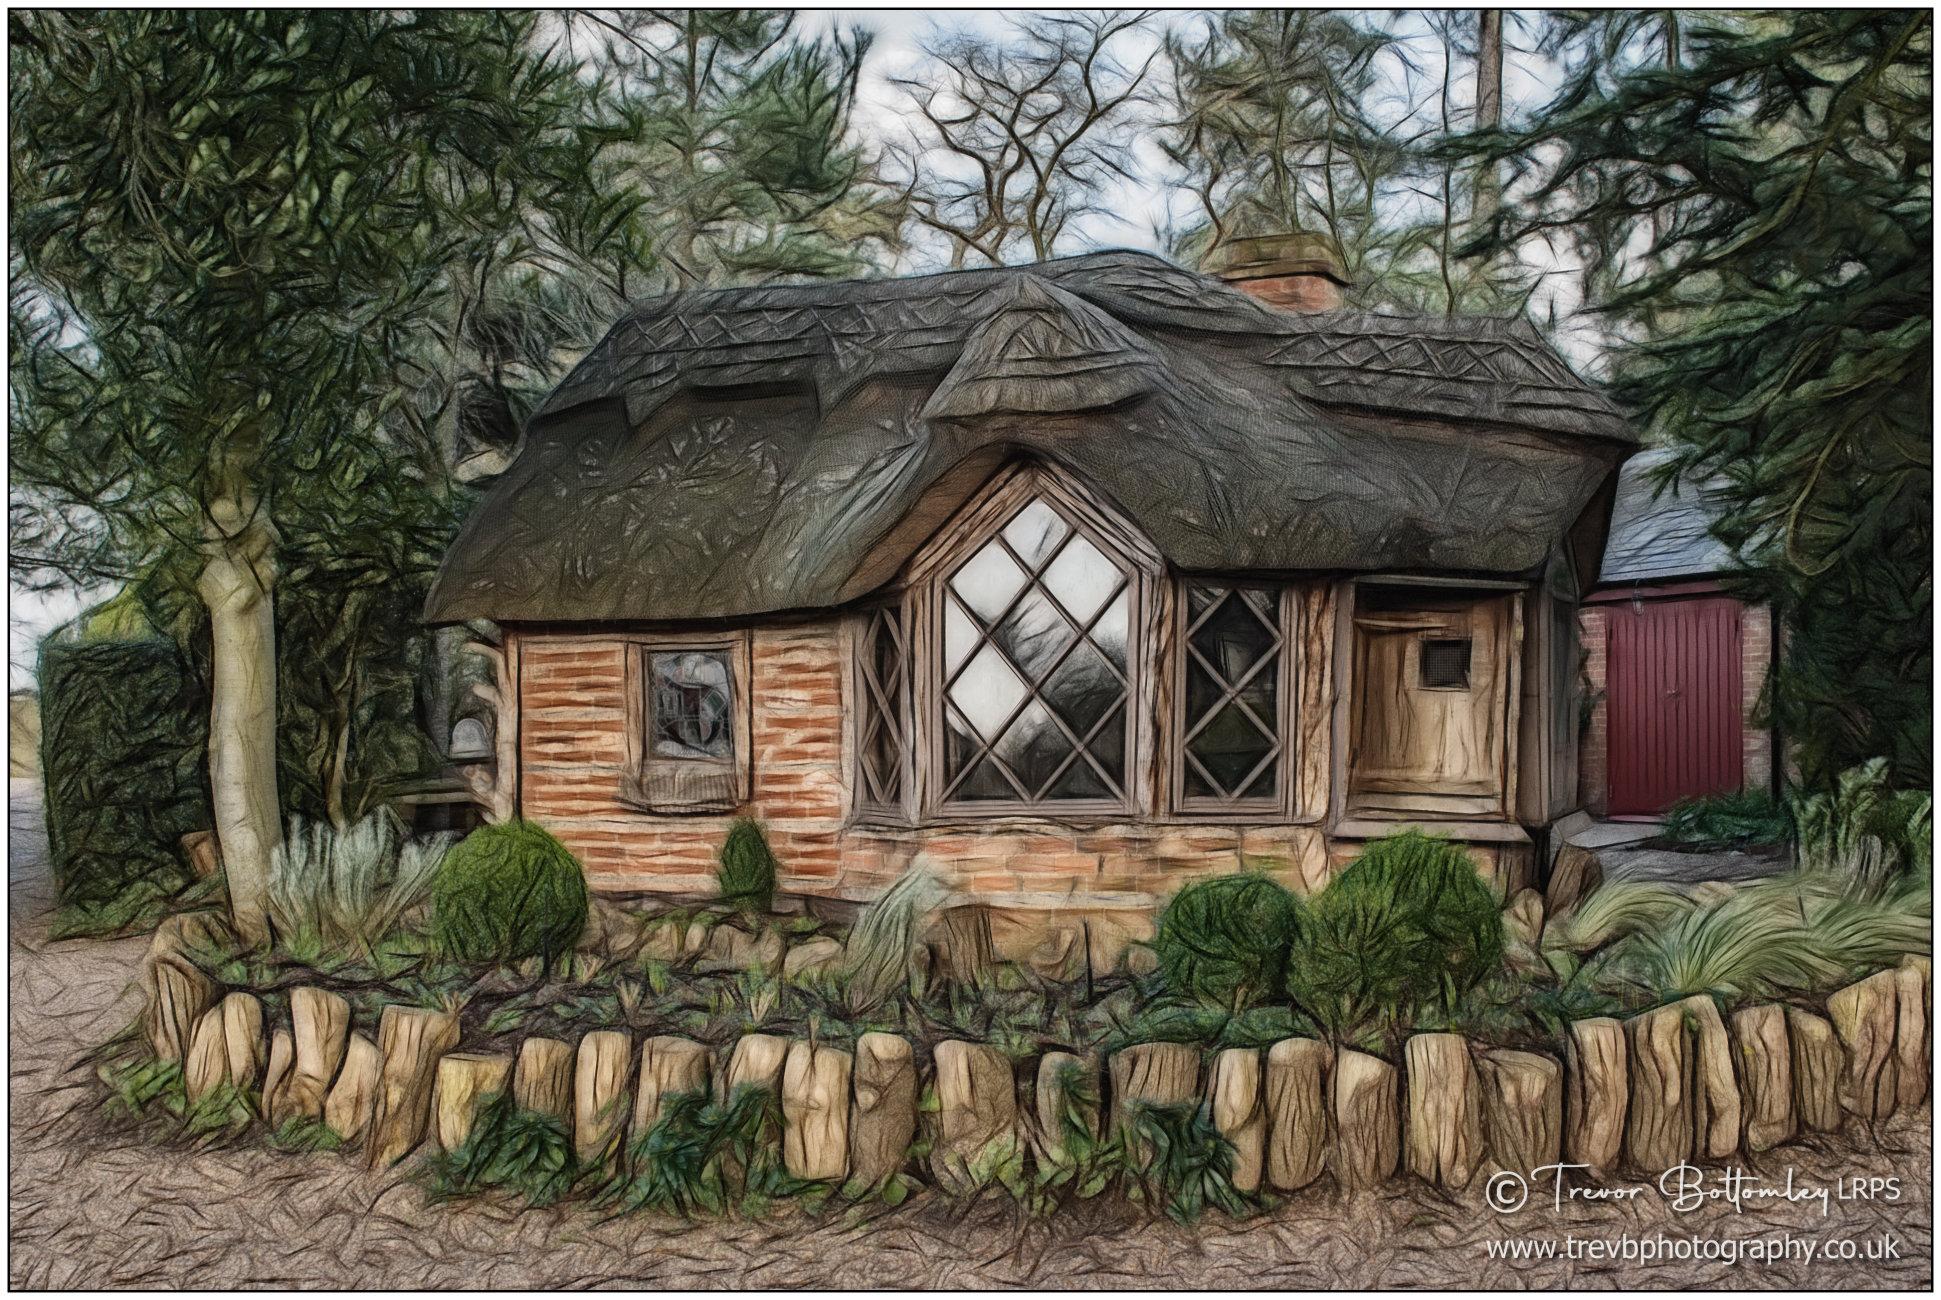 The Summerhouse, Charlecote Park